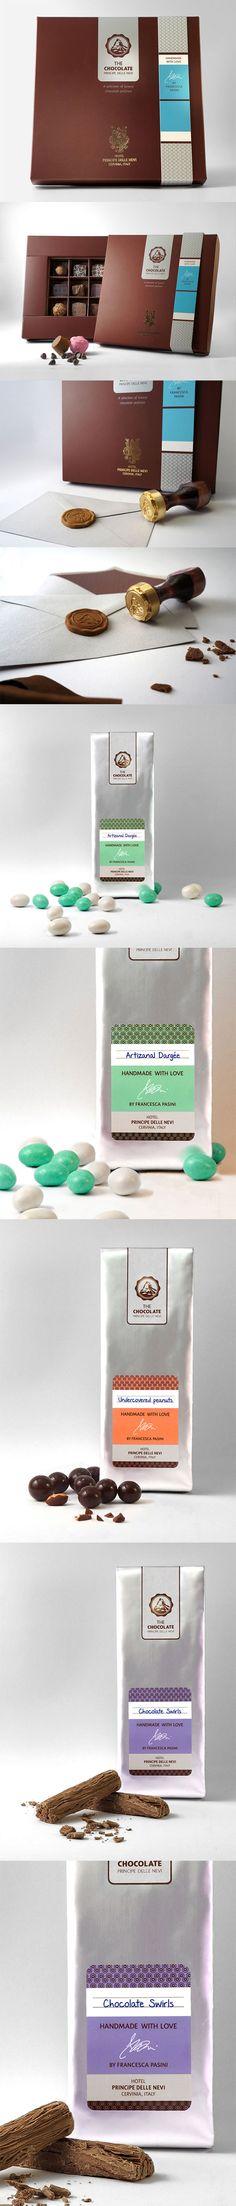 Cool Brand Identity Design. The Chocolate. #branding #brandidentity [http://www.pinterest.com/alfredchong/]